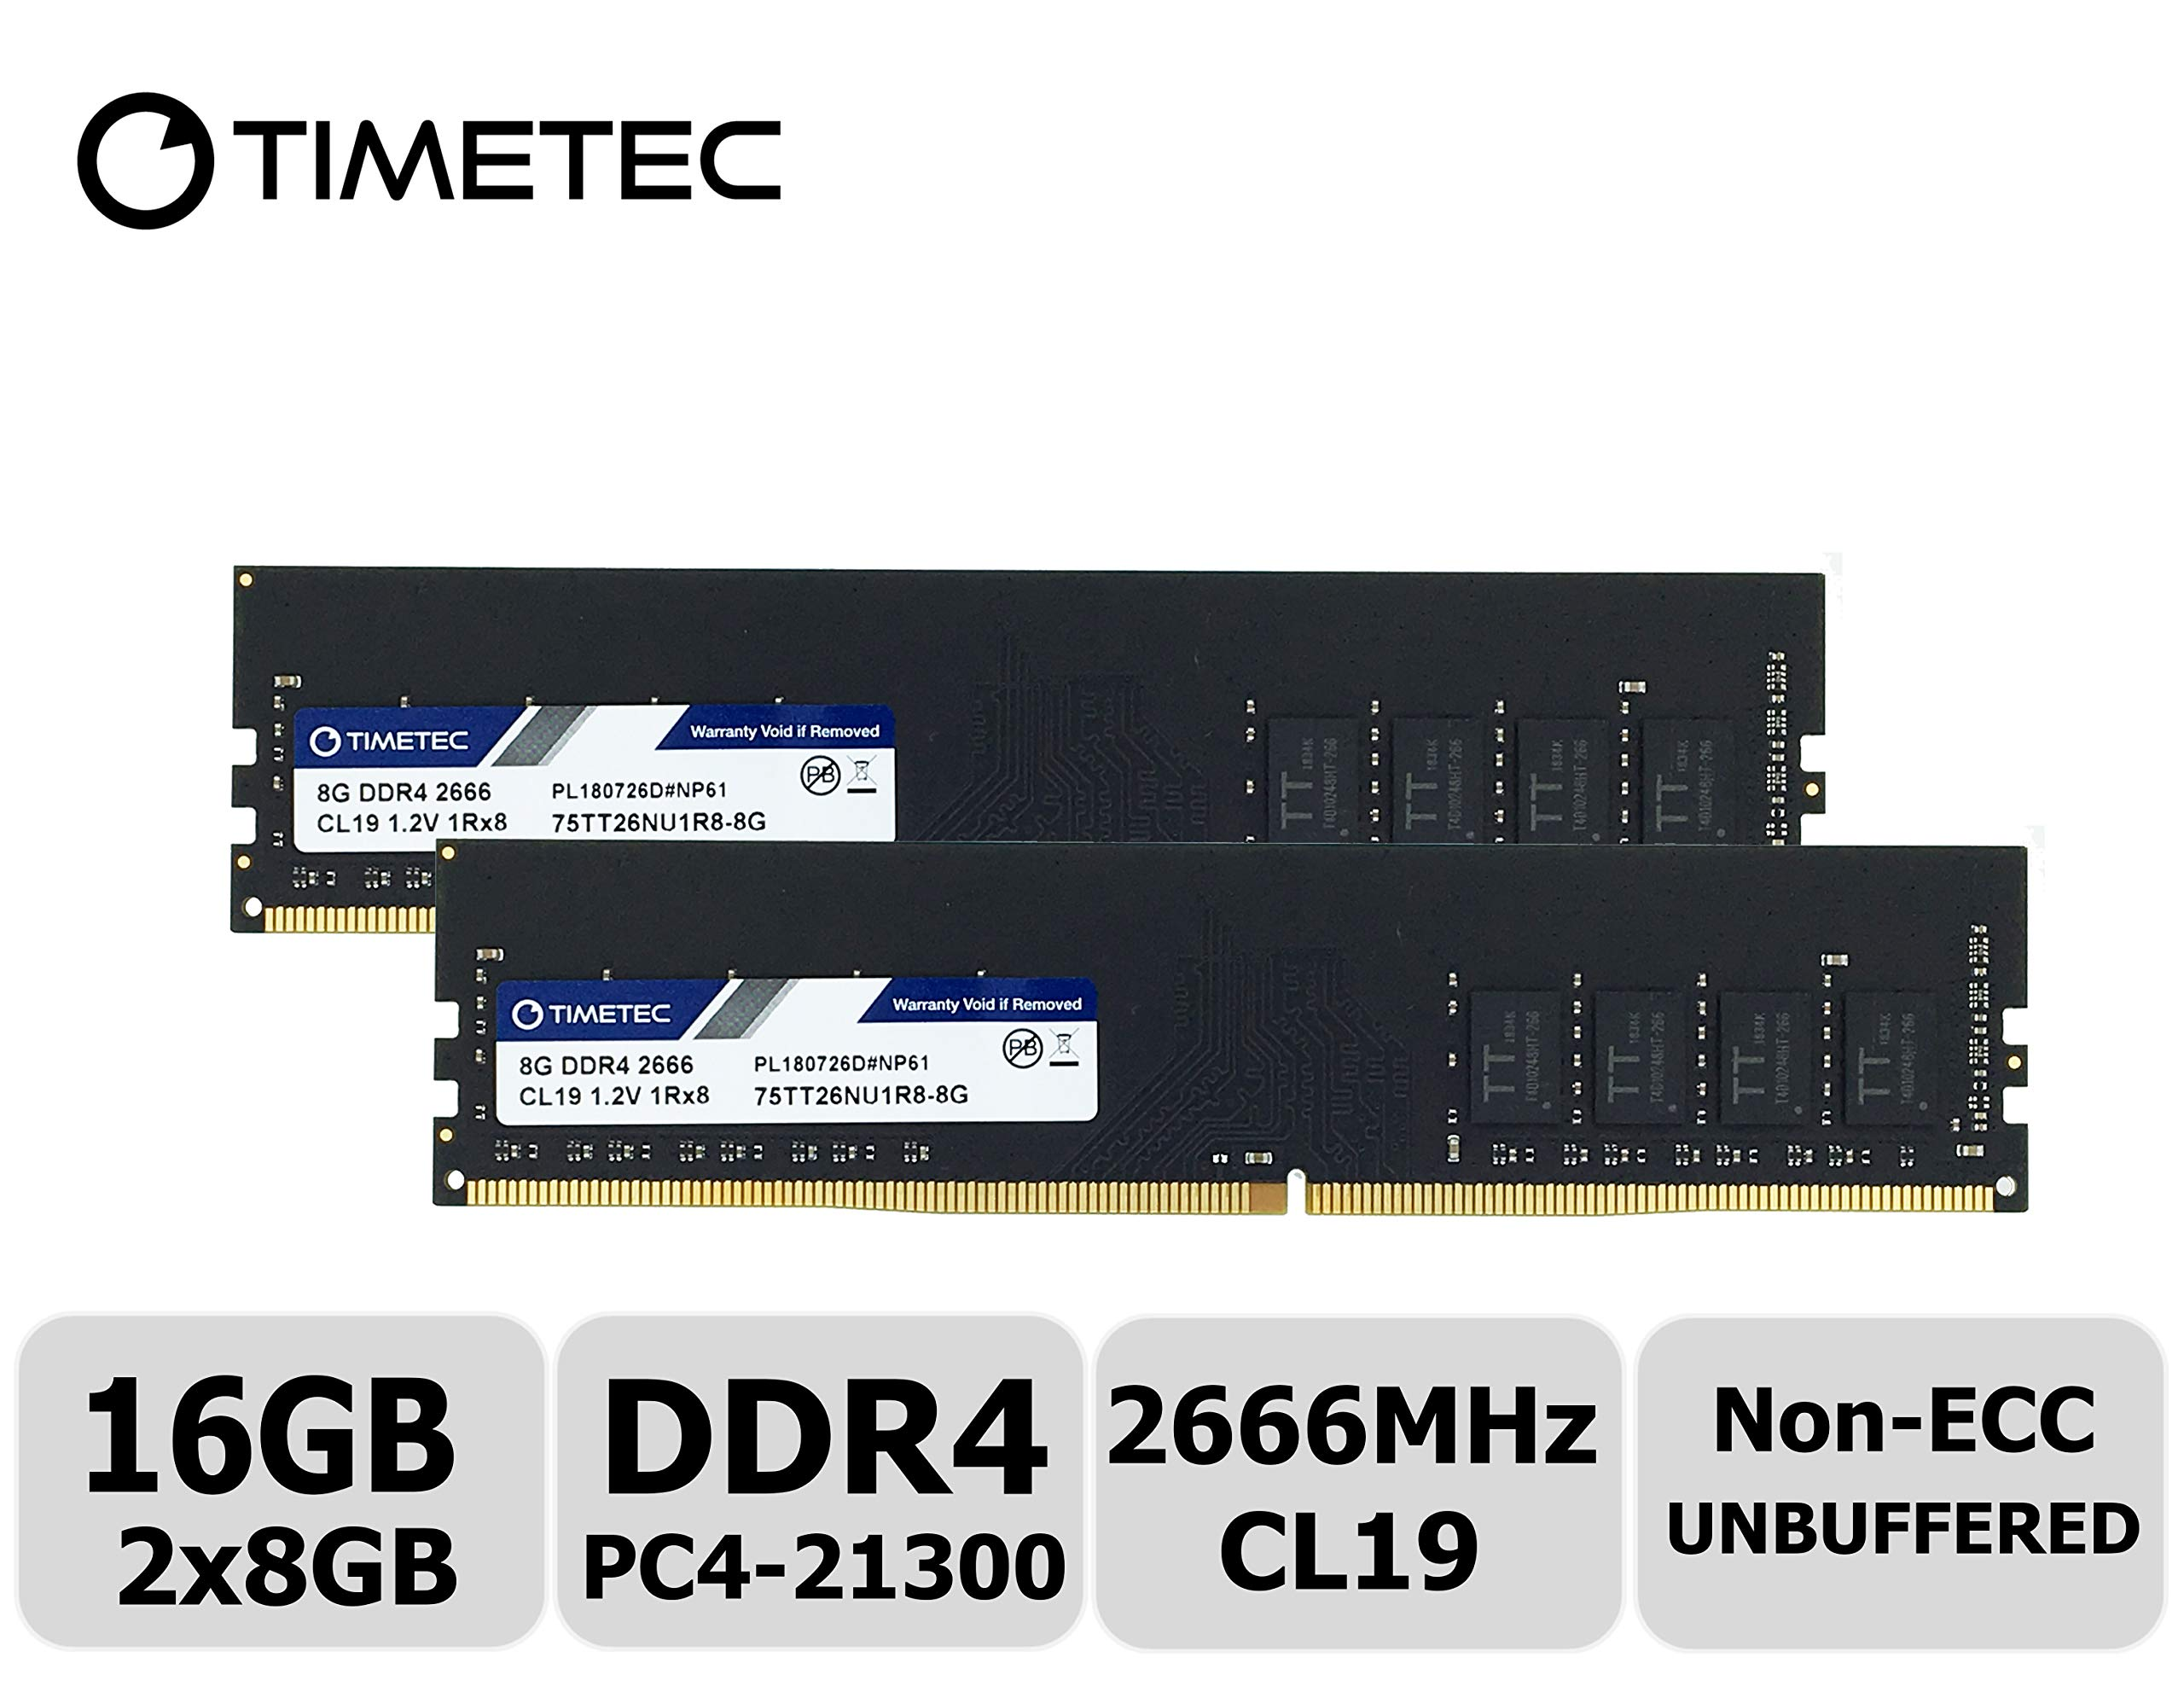 Memoria RAM 16GB Timetec Hynix IC Kit (2x8GB) DDR4 2666MHz PC4-21300 Unbuffered Non-ECC 1.2V CL19 1Rx8 Single Rank 288 P